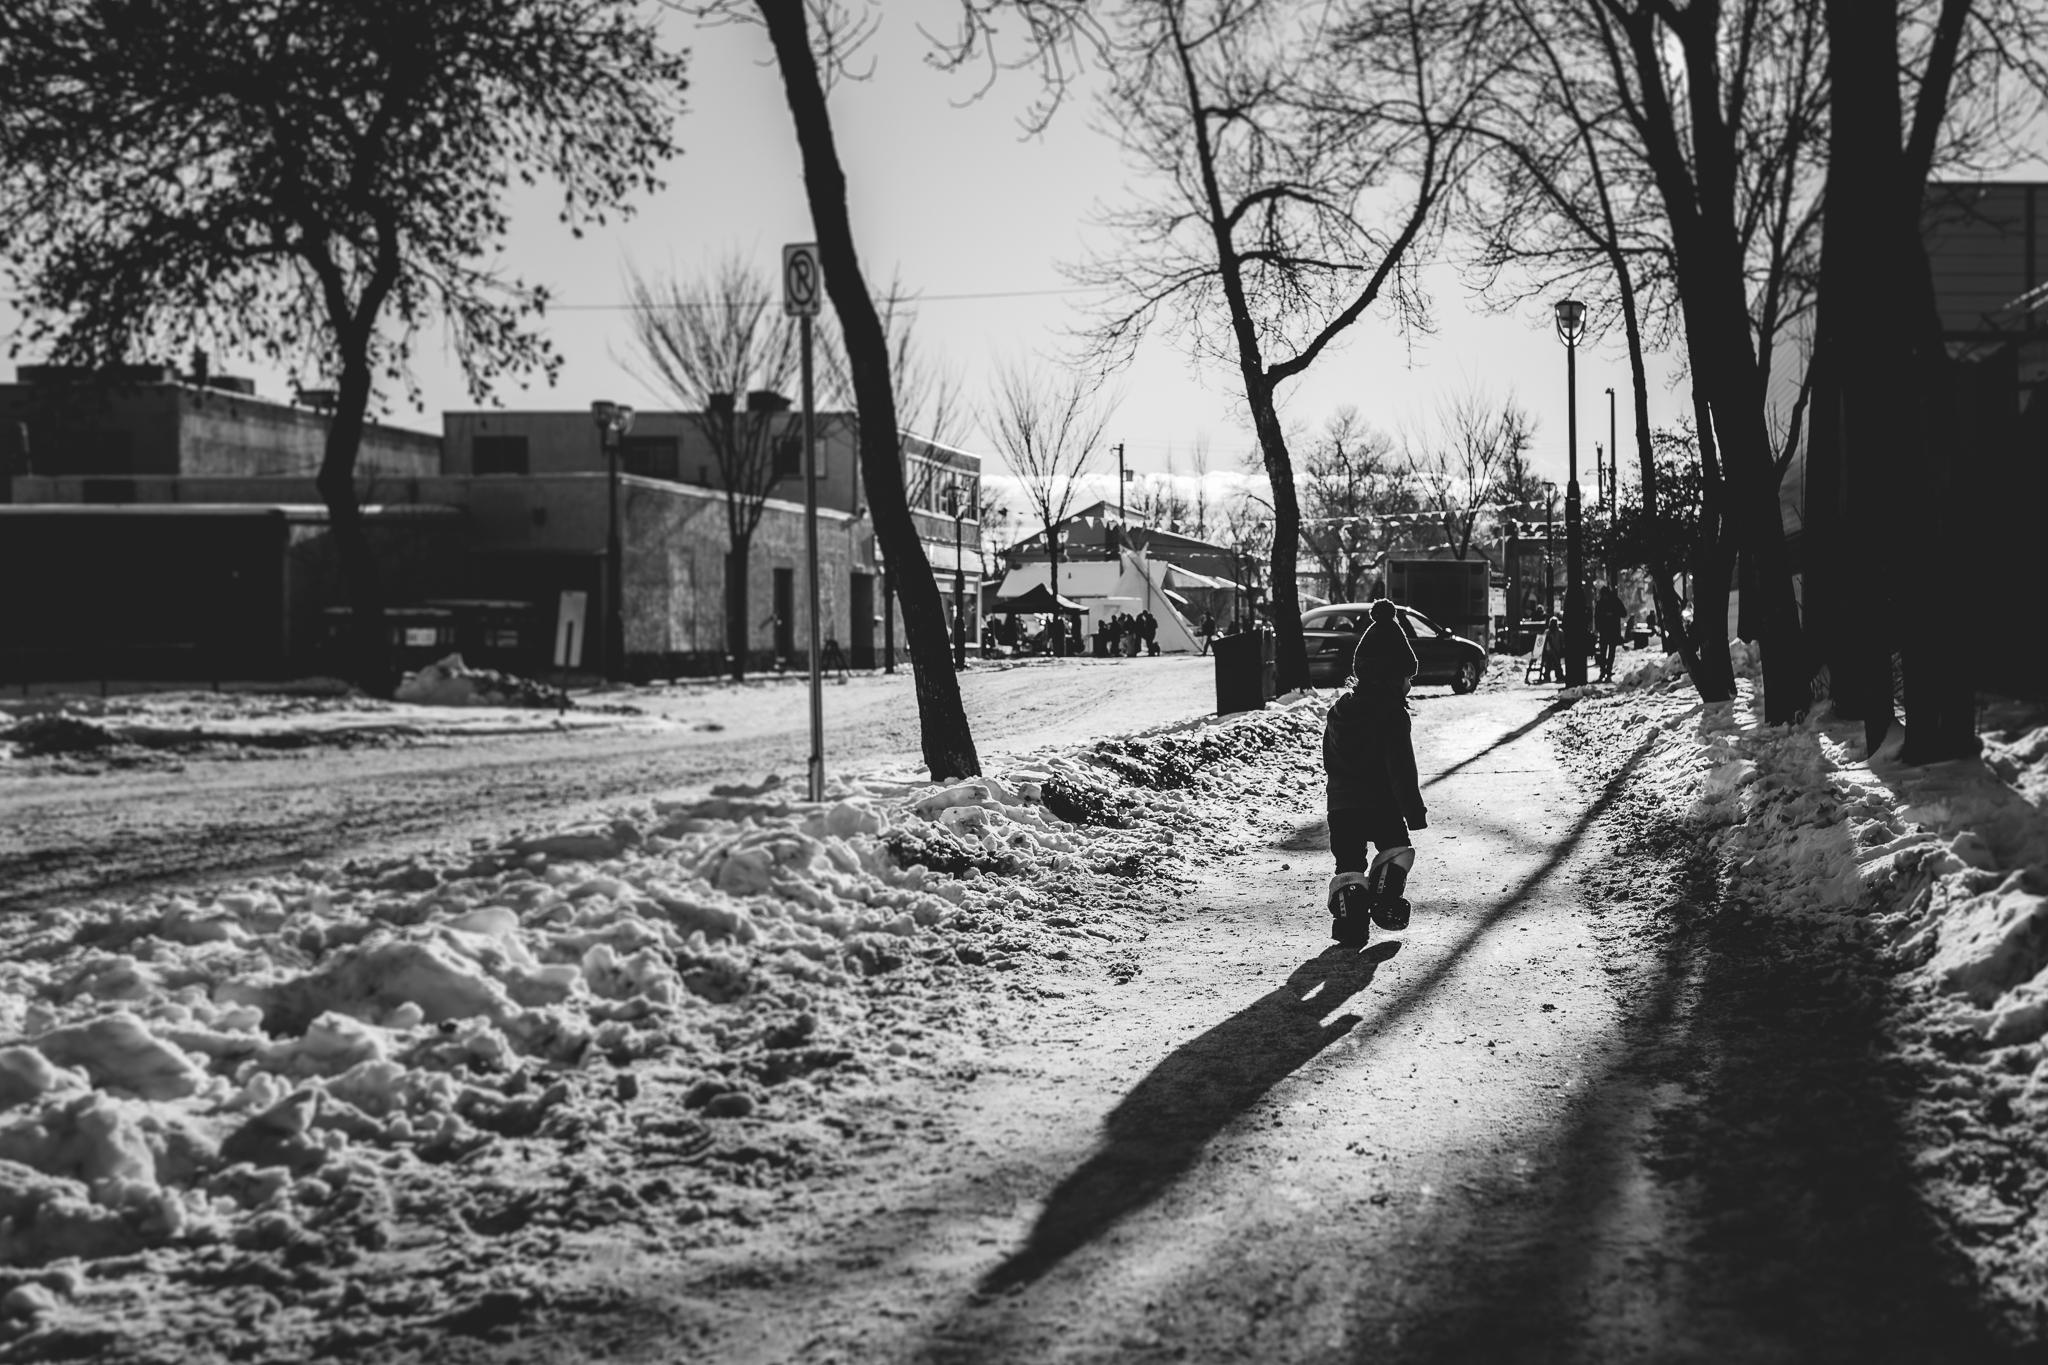 52Frames-Week 3-Black and White - Edmonton Lifestyle Photographer